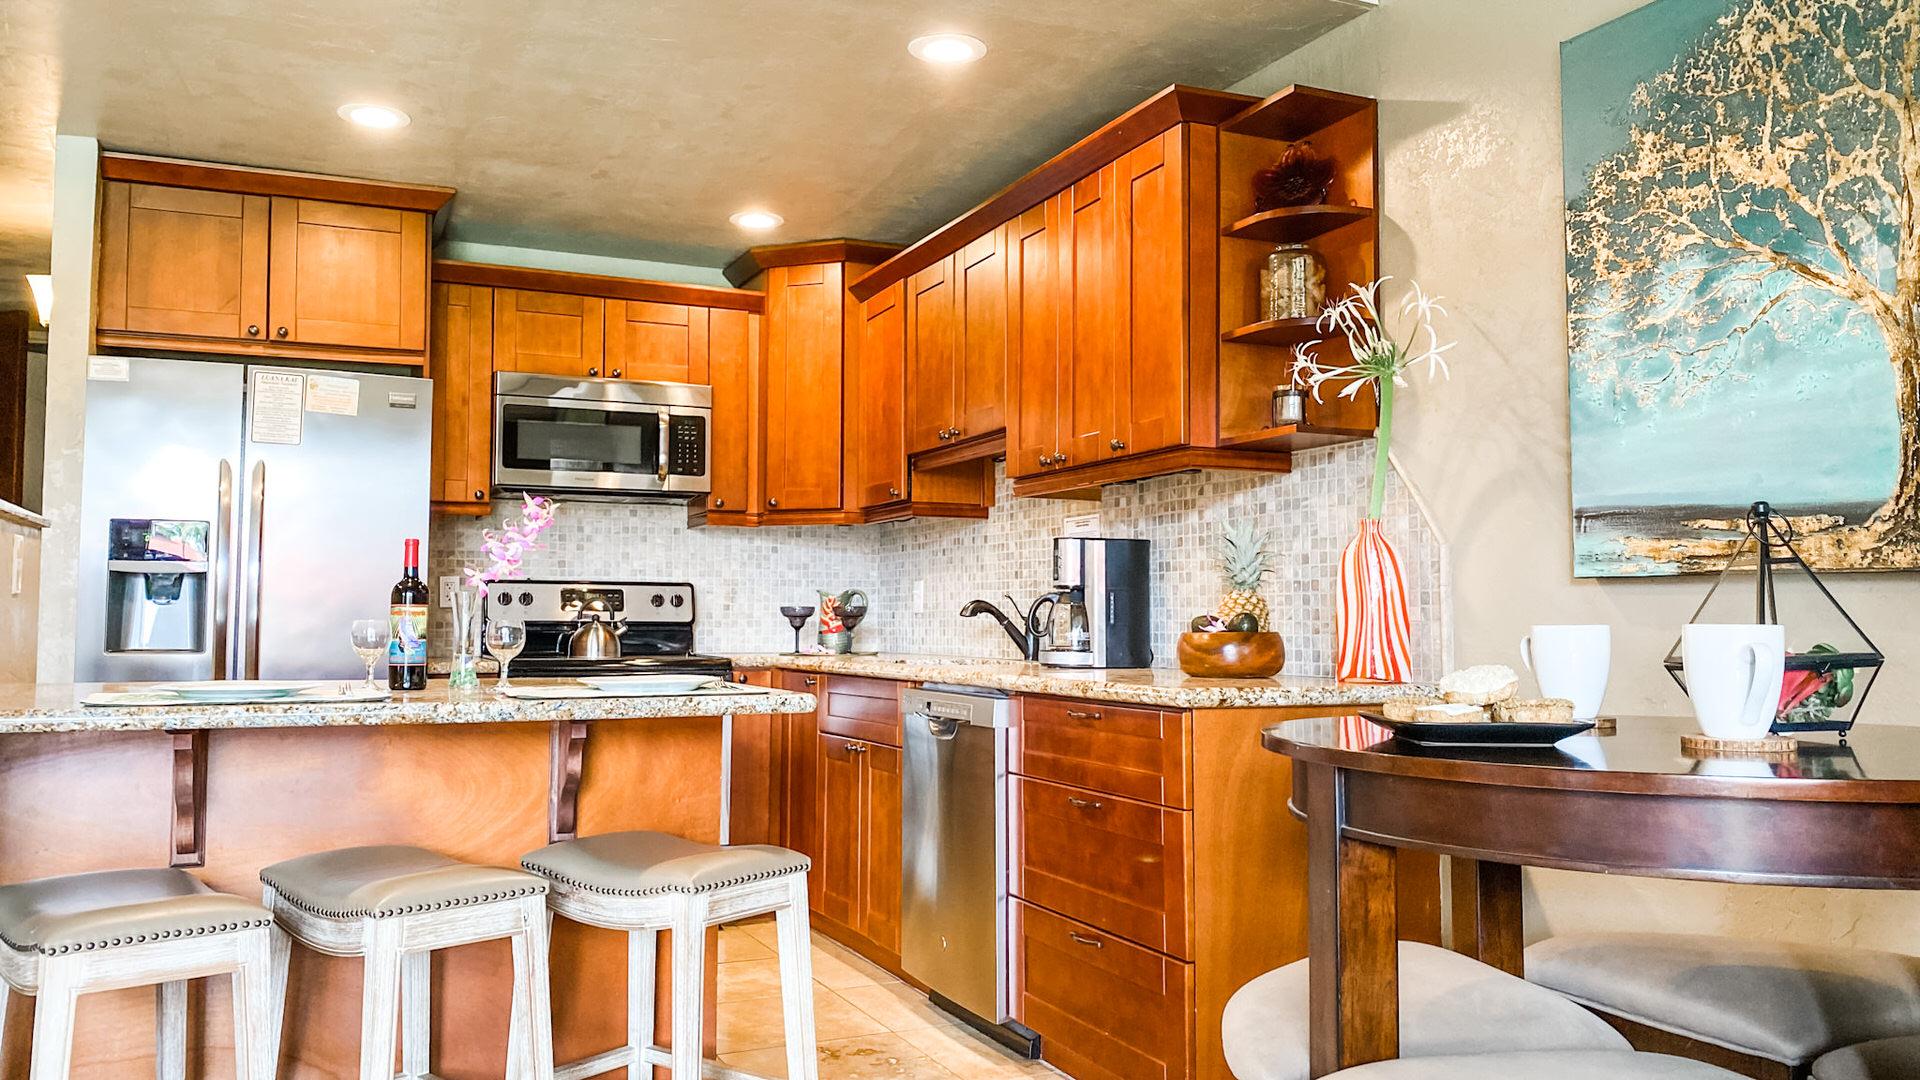 C305 Kitchen and Bar